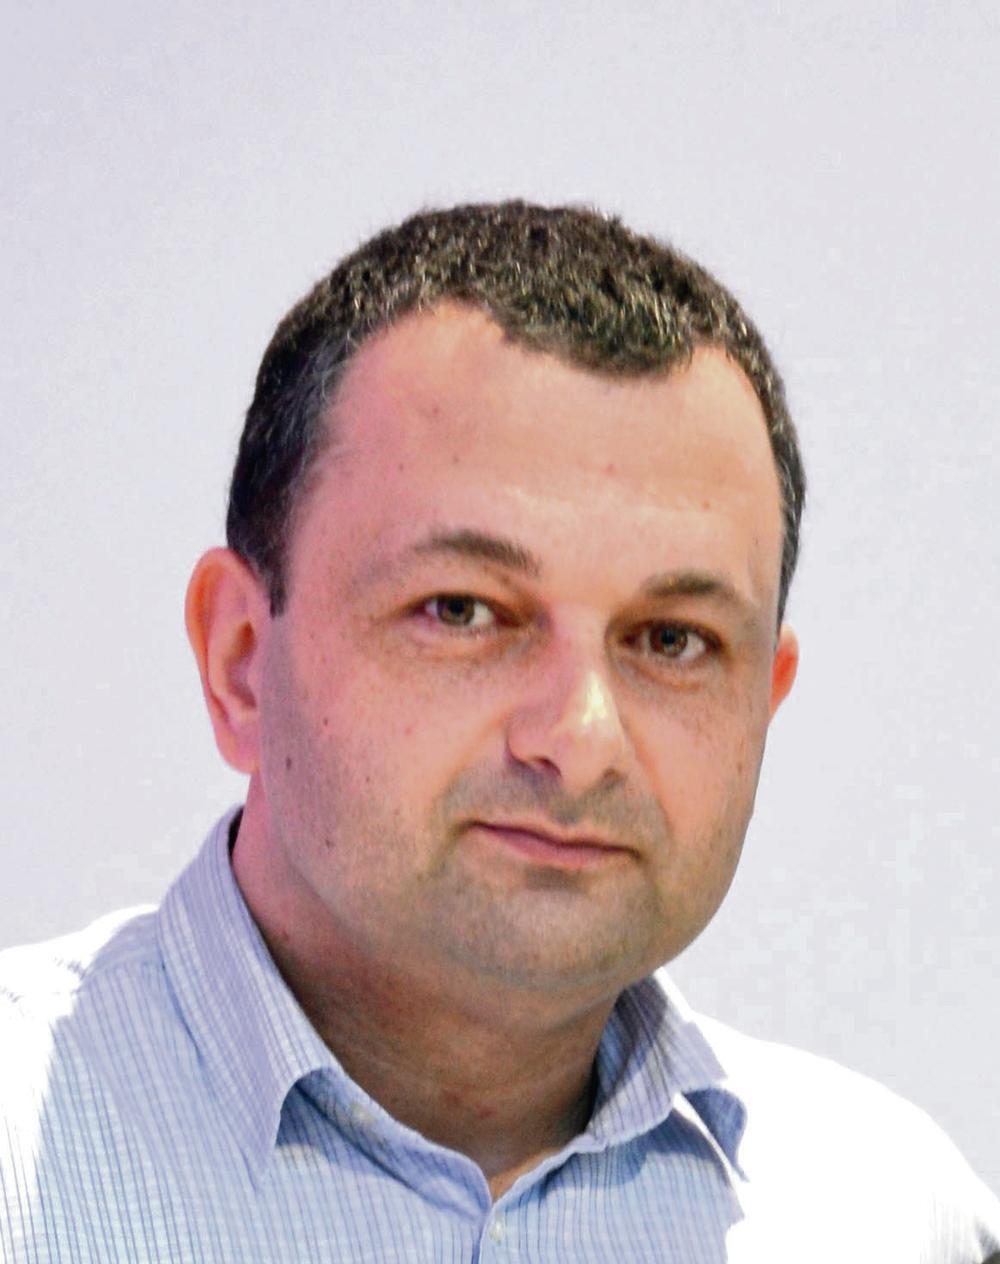 Radoljub Živadinović